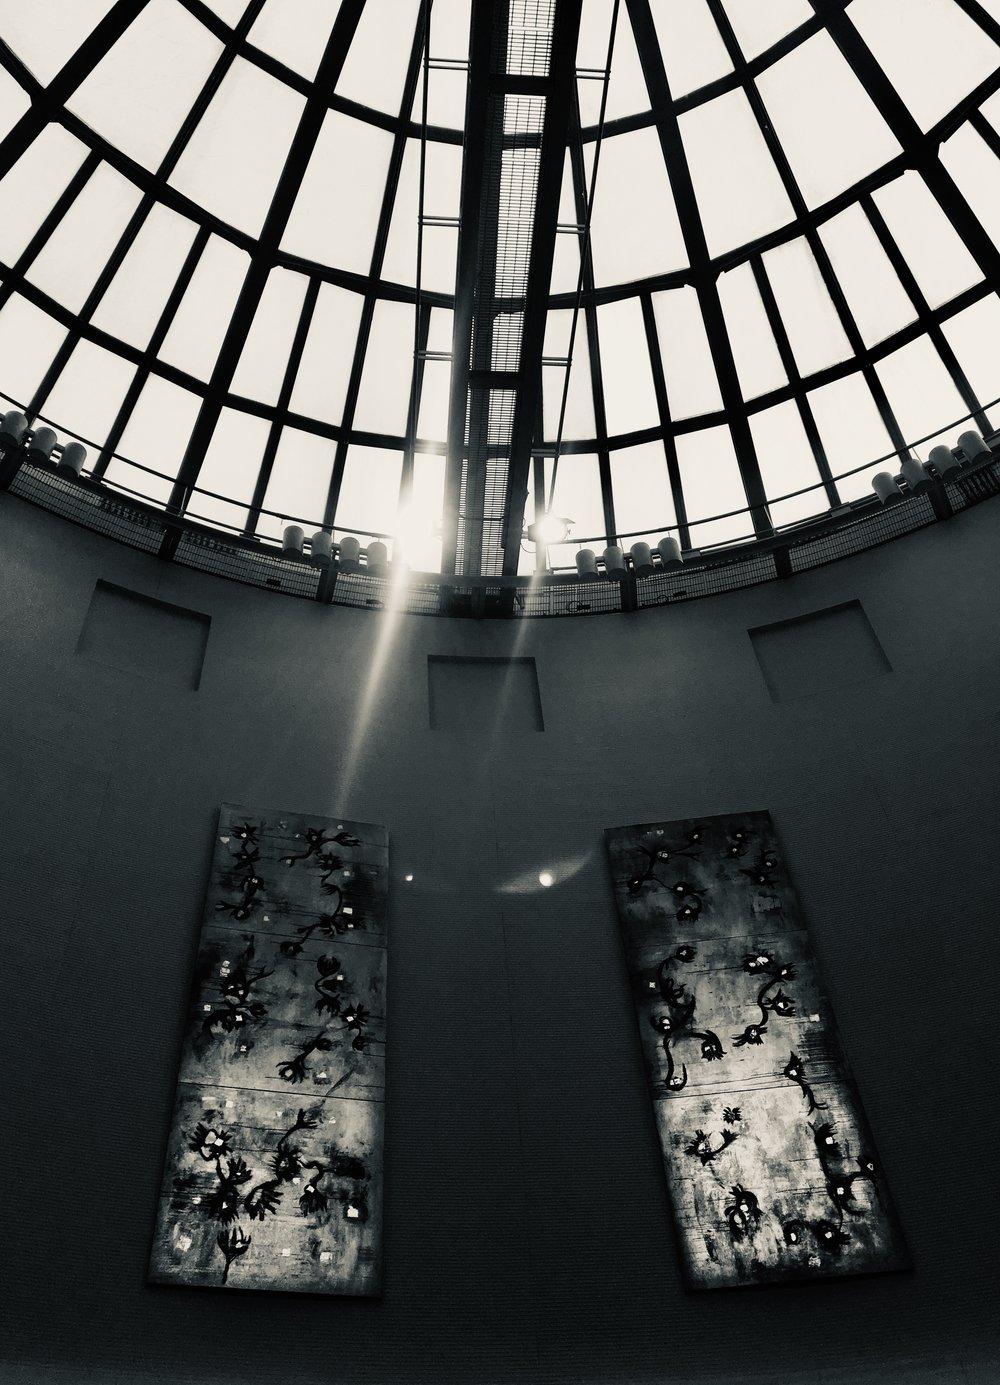 SPIRAL HALL, HONO UEHARA5.jpg